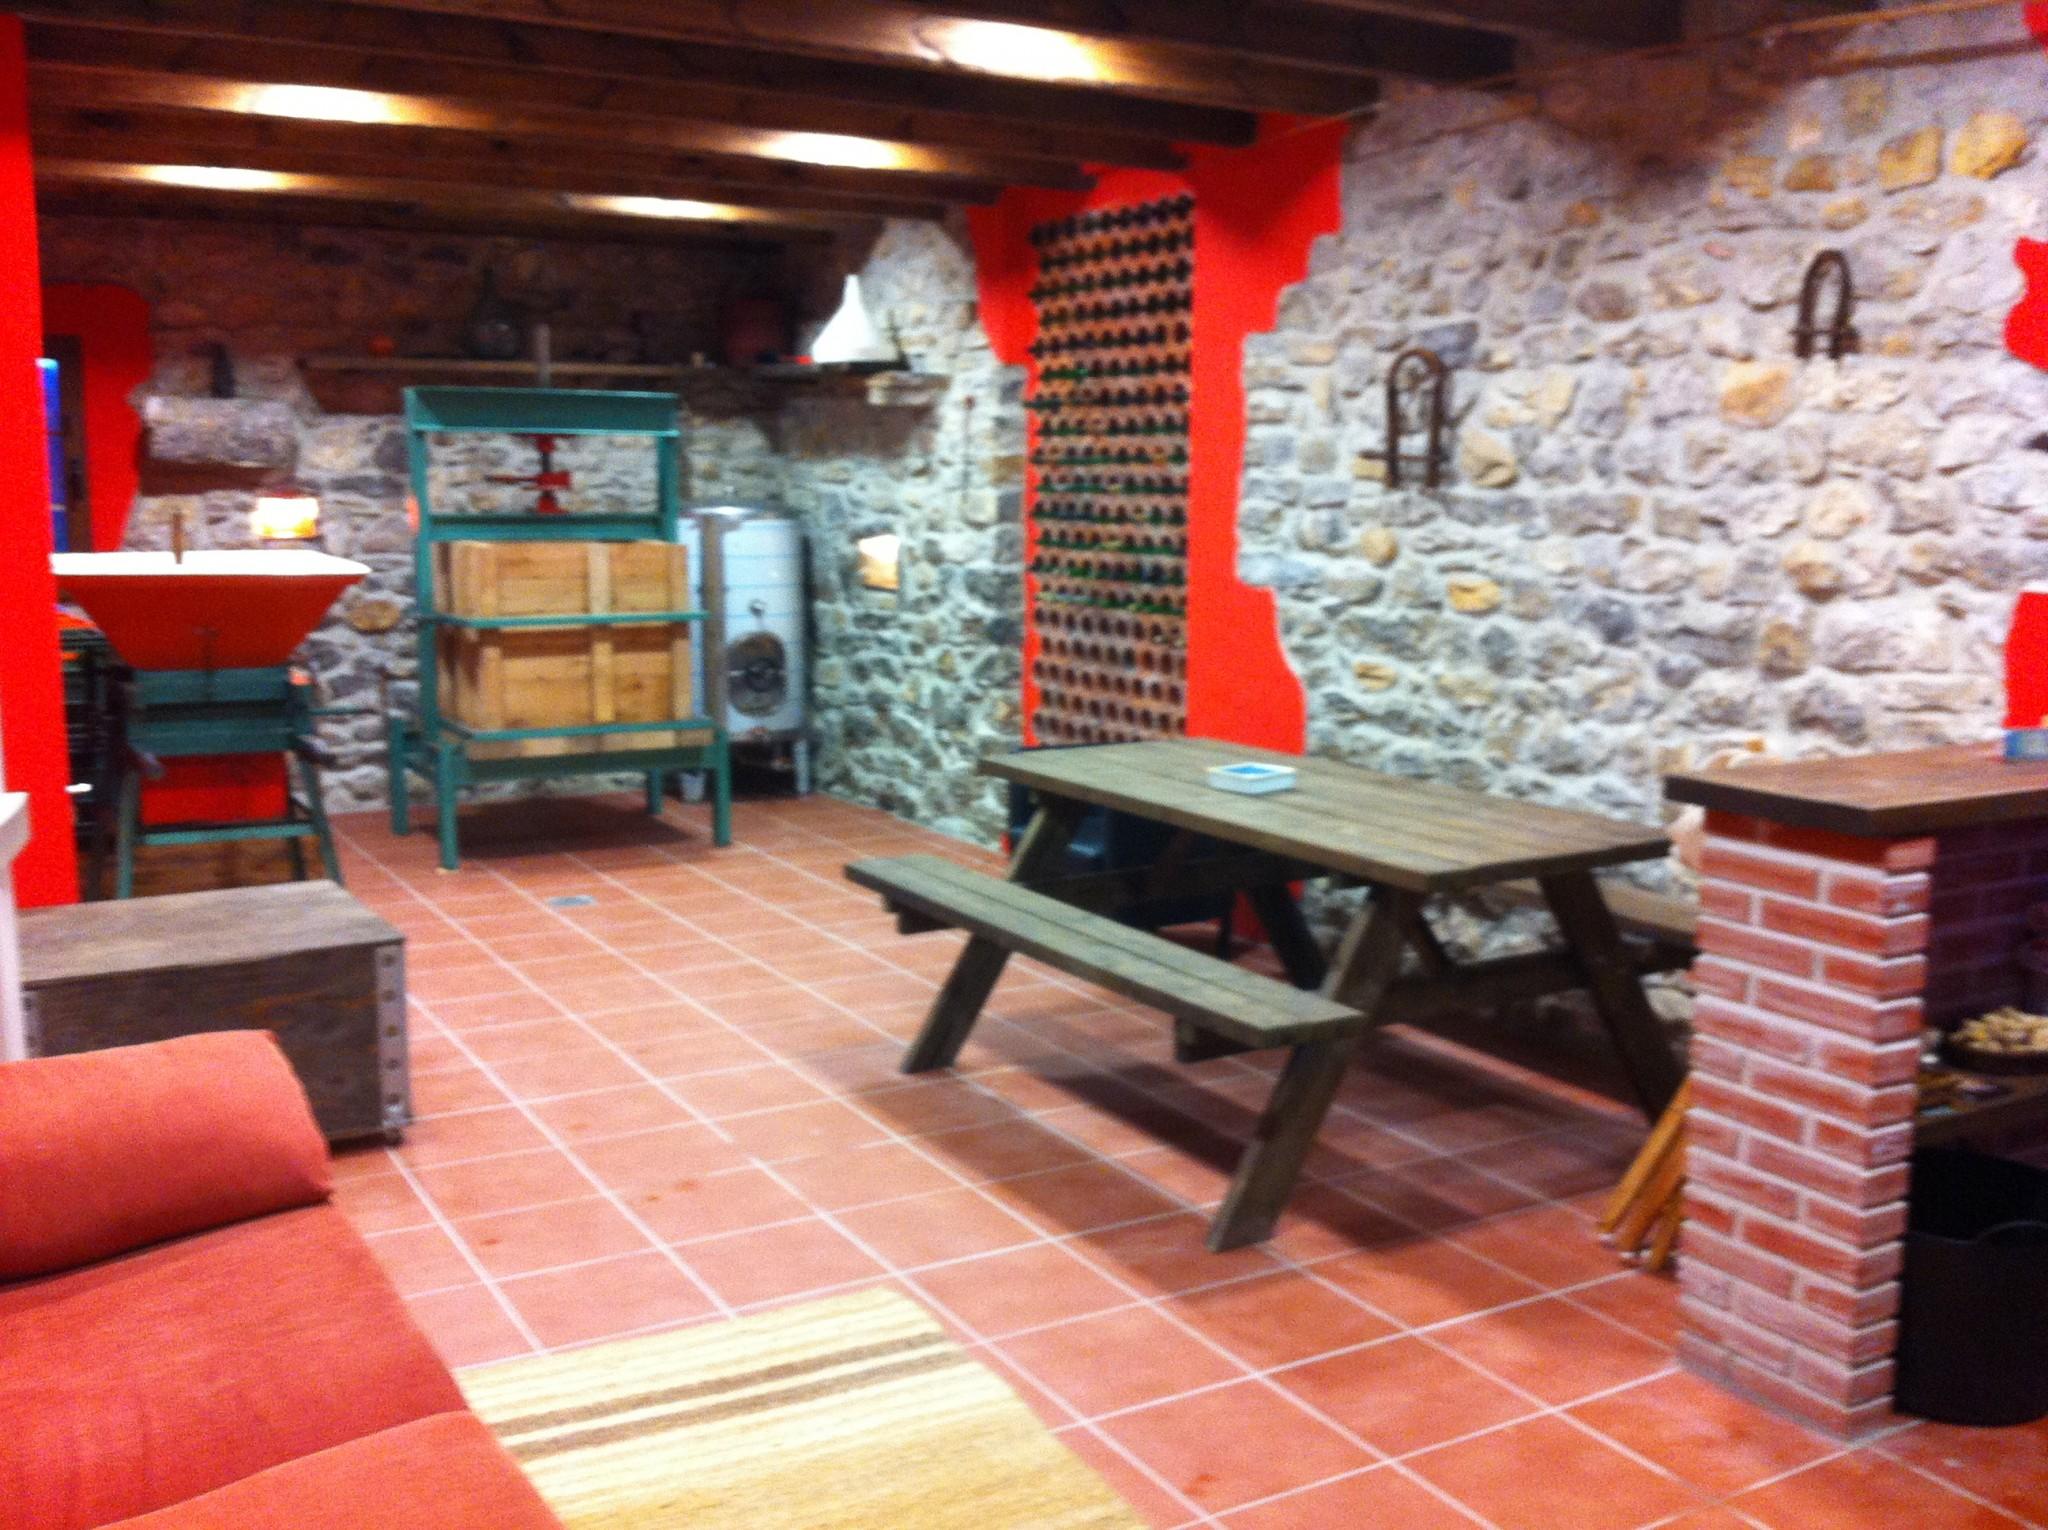 Apfelweinkeller Rincon Sella, Ribadesella